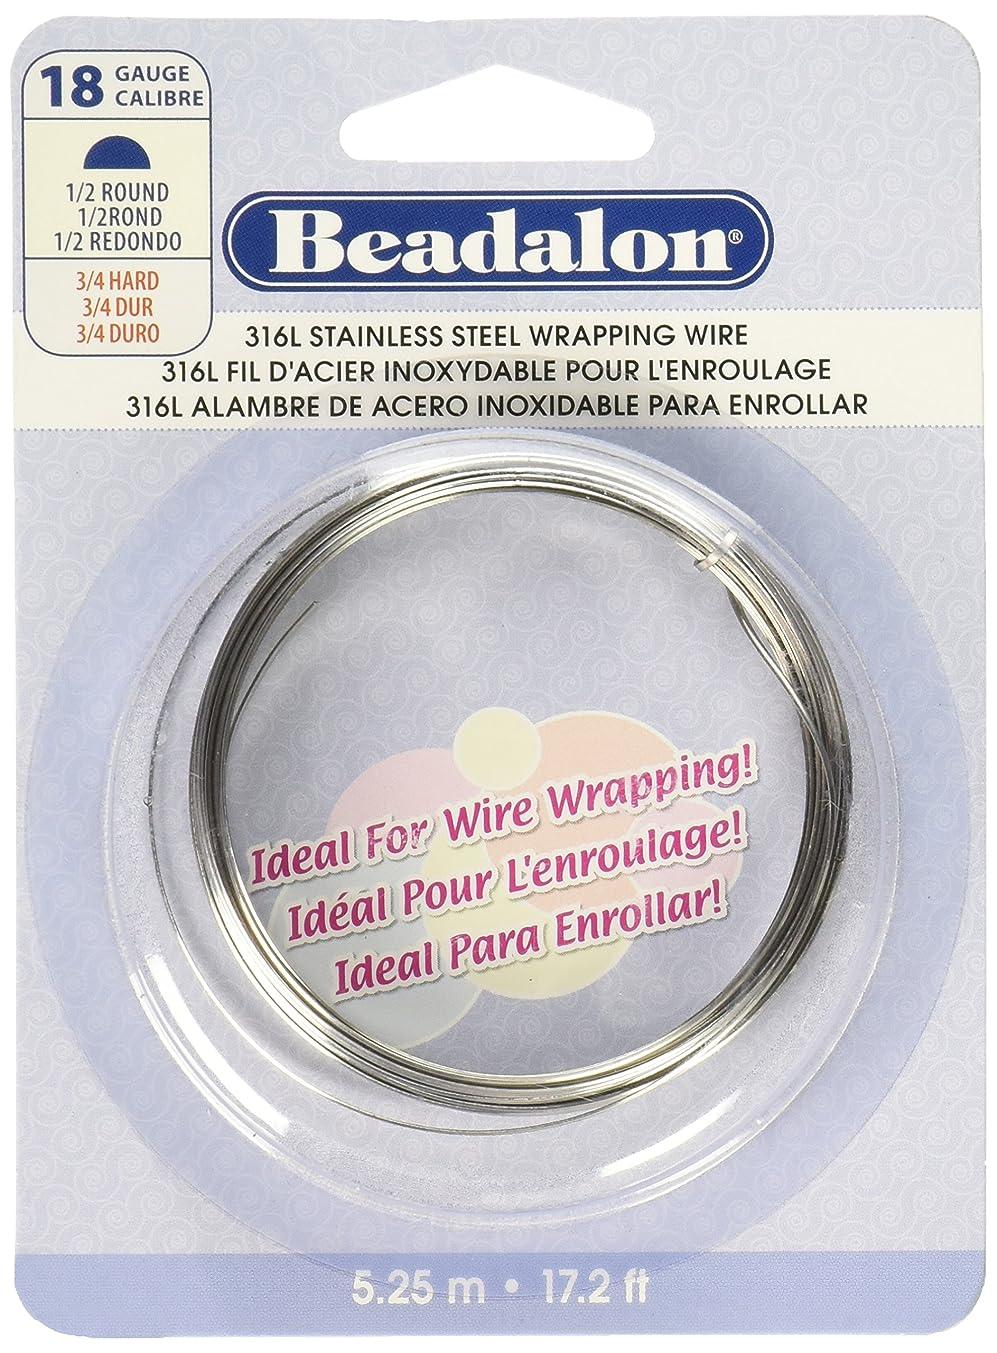 Beadalon 180S-118 18-Gauge Stainless Steel Half Round Bright Wire for Jewelry Making, 5.25m